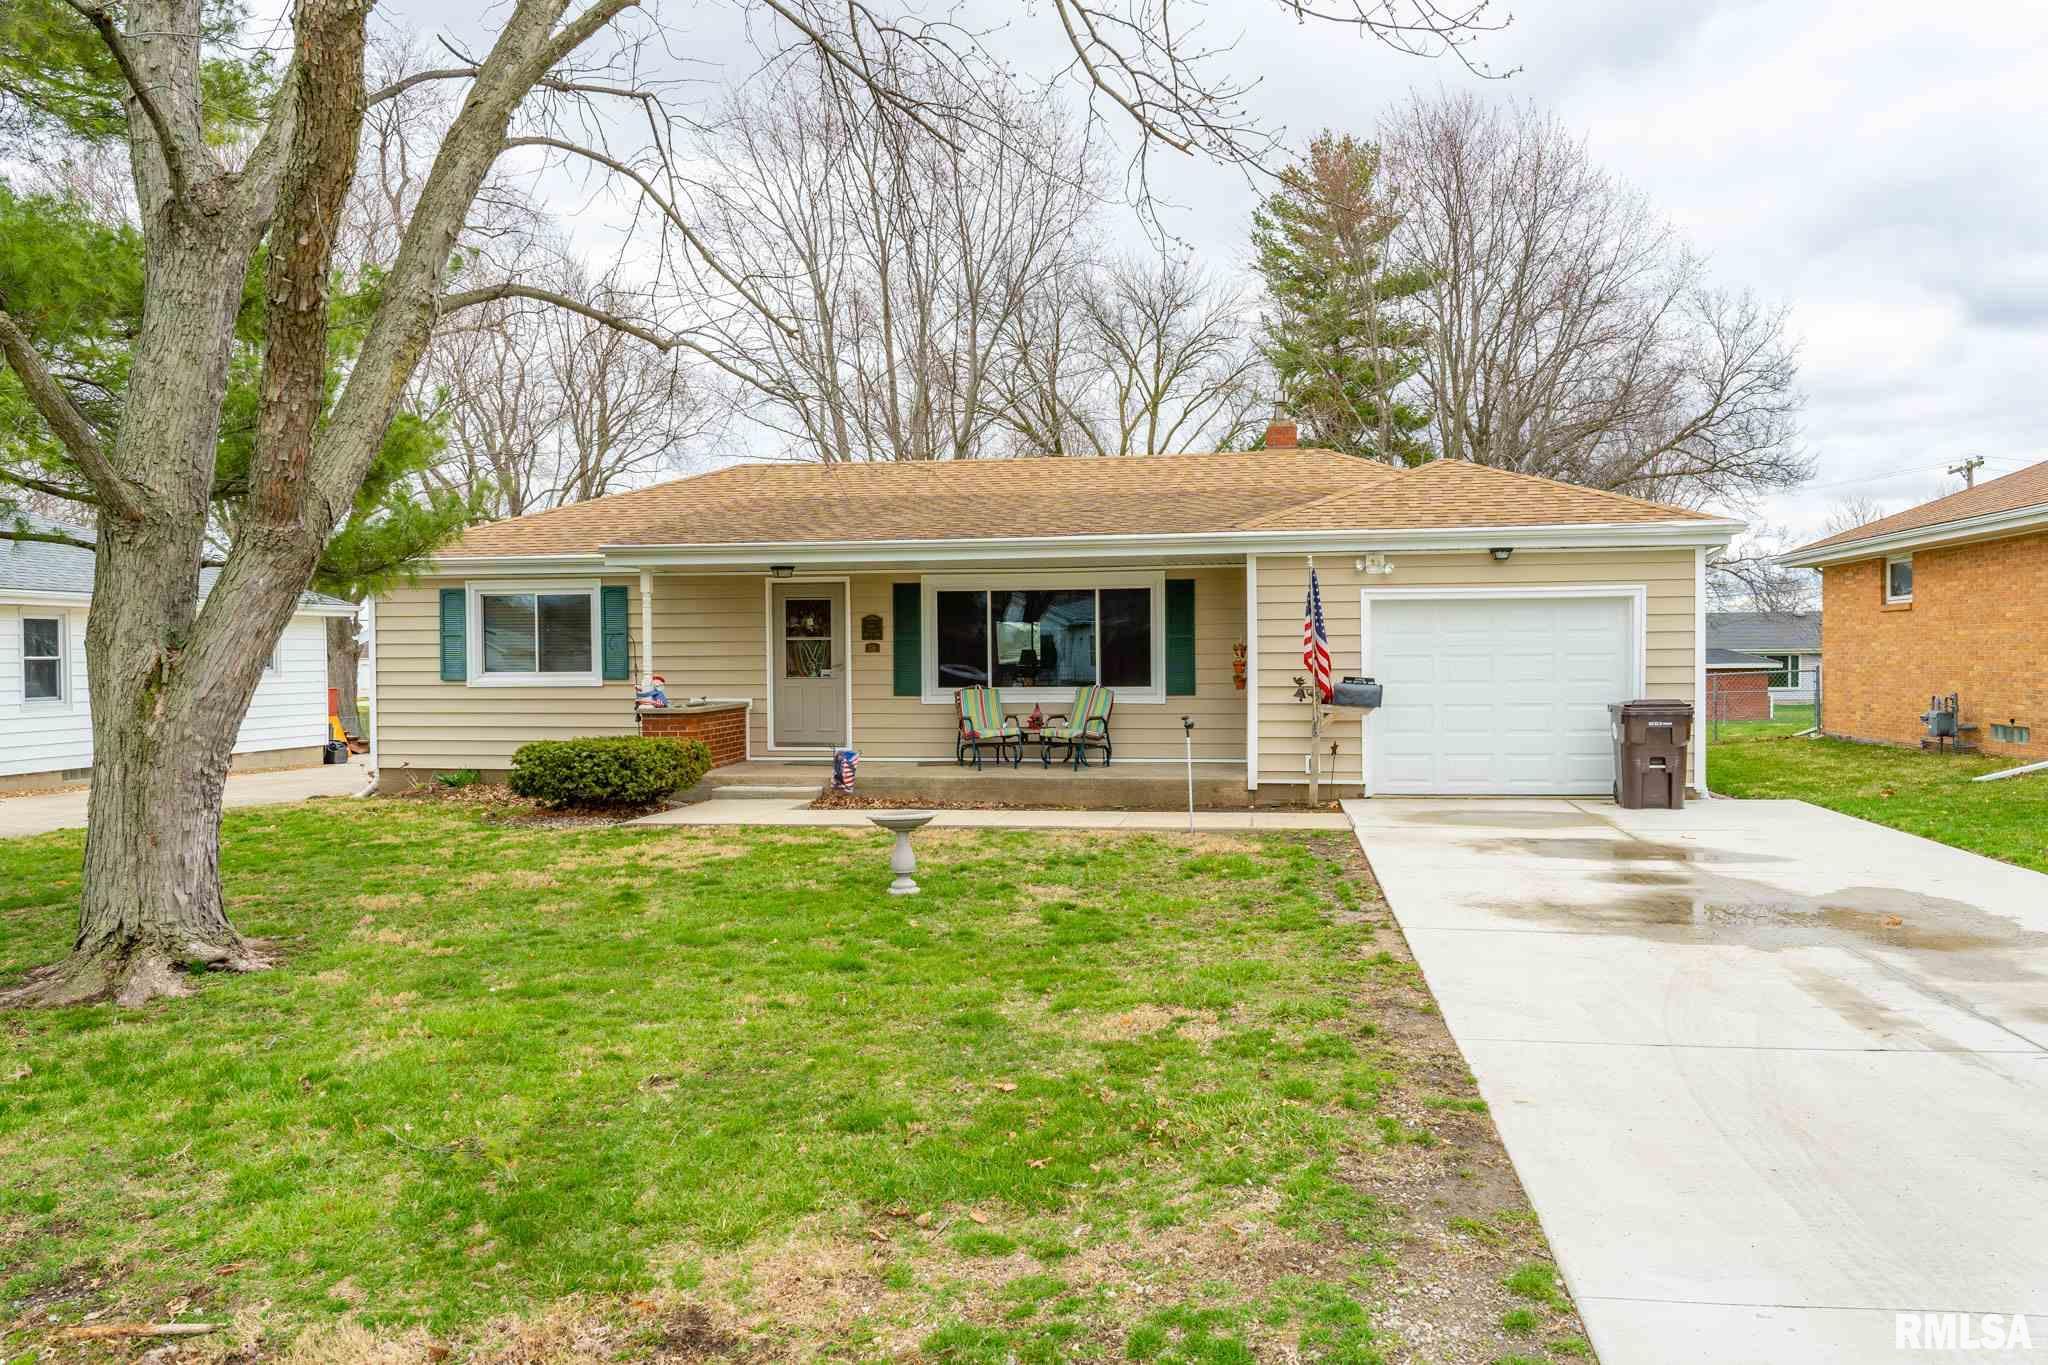 519 N SCOTT Property Photo - Mt Pulaski, IL real estate listing